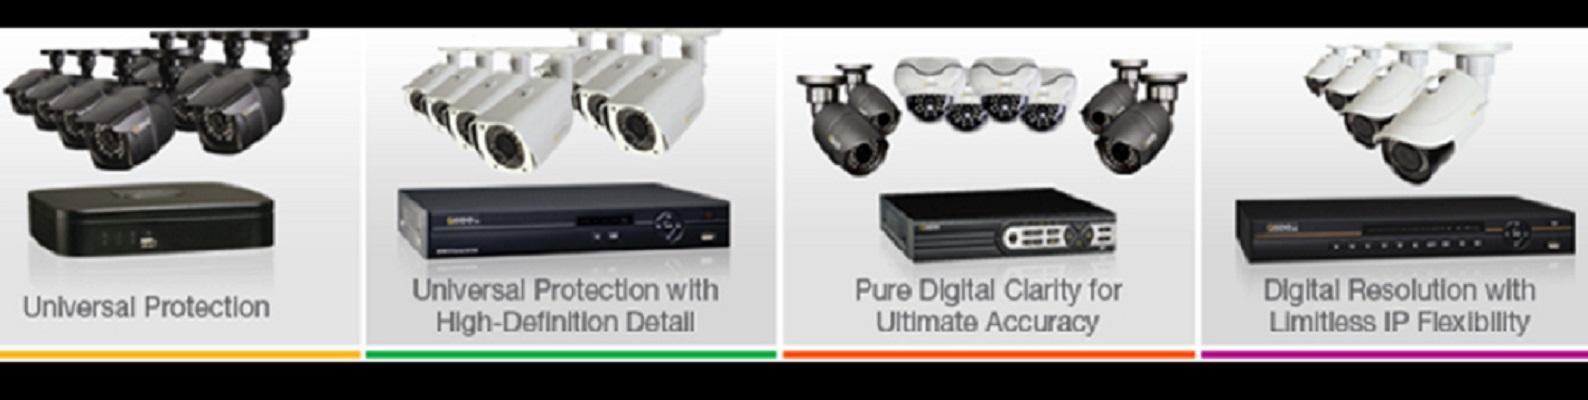 Surveillance Systems - Security Camera